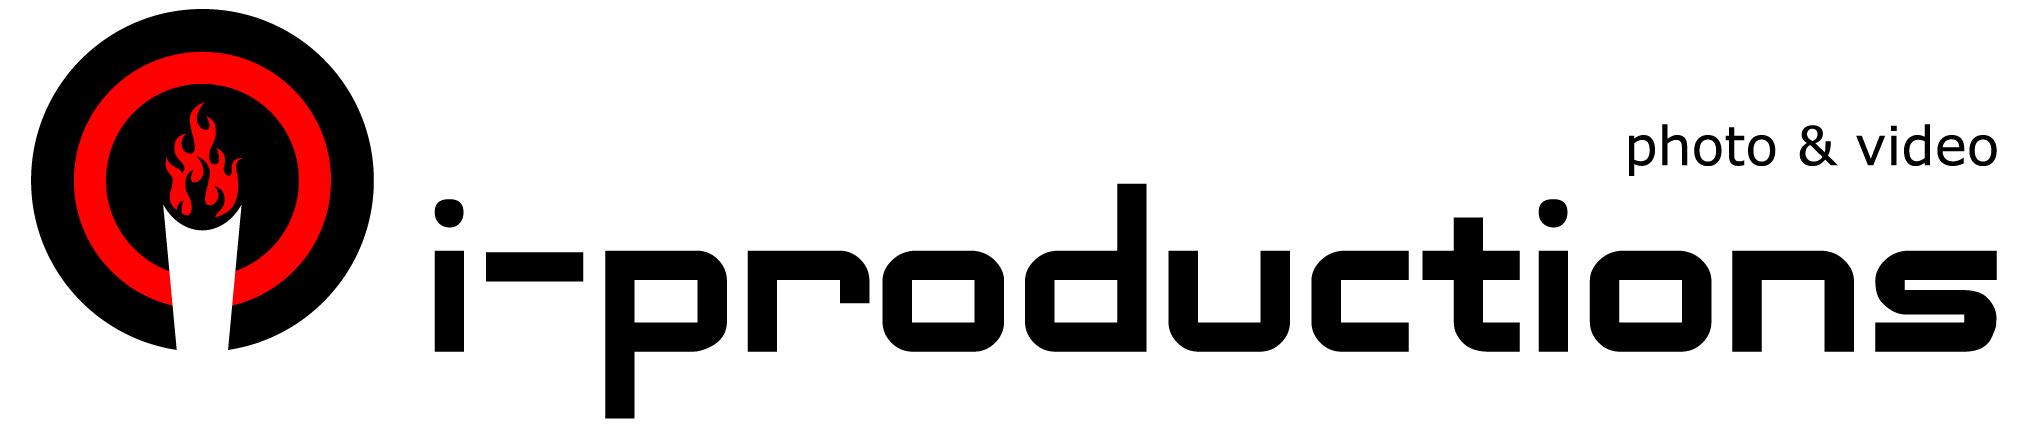 Logo blackx